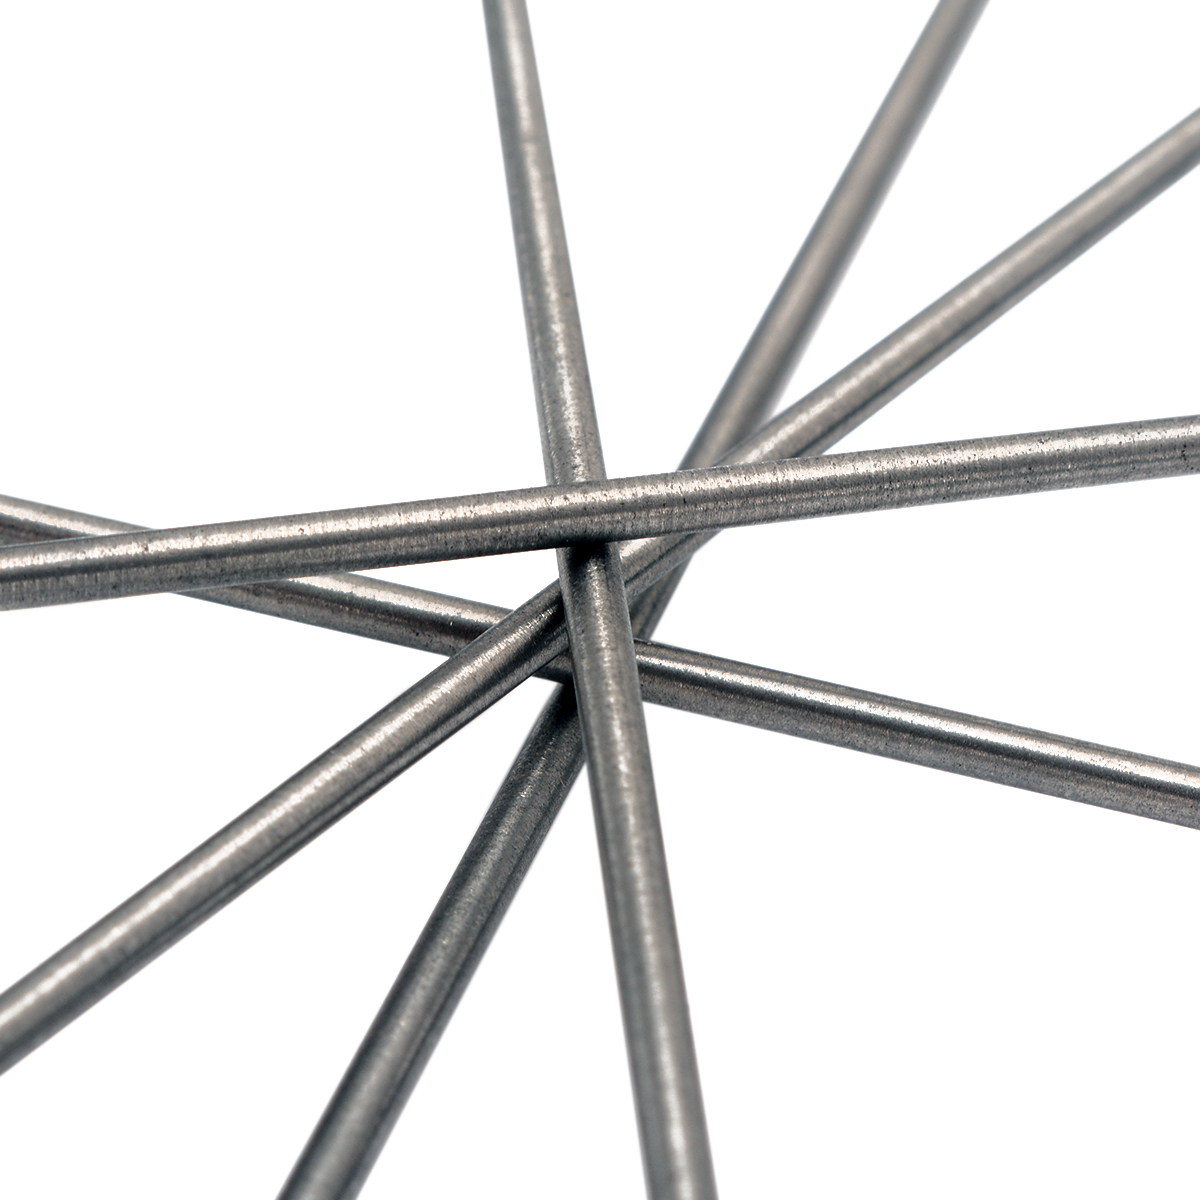 5pcs/Lot Grade 5 Ti Bars GR5 Practical Titanium Metal Rod 2mm*250mm Sticks For Manufacturing Welding